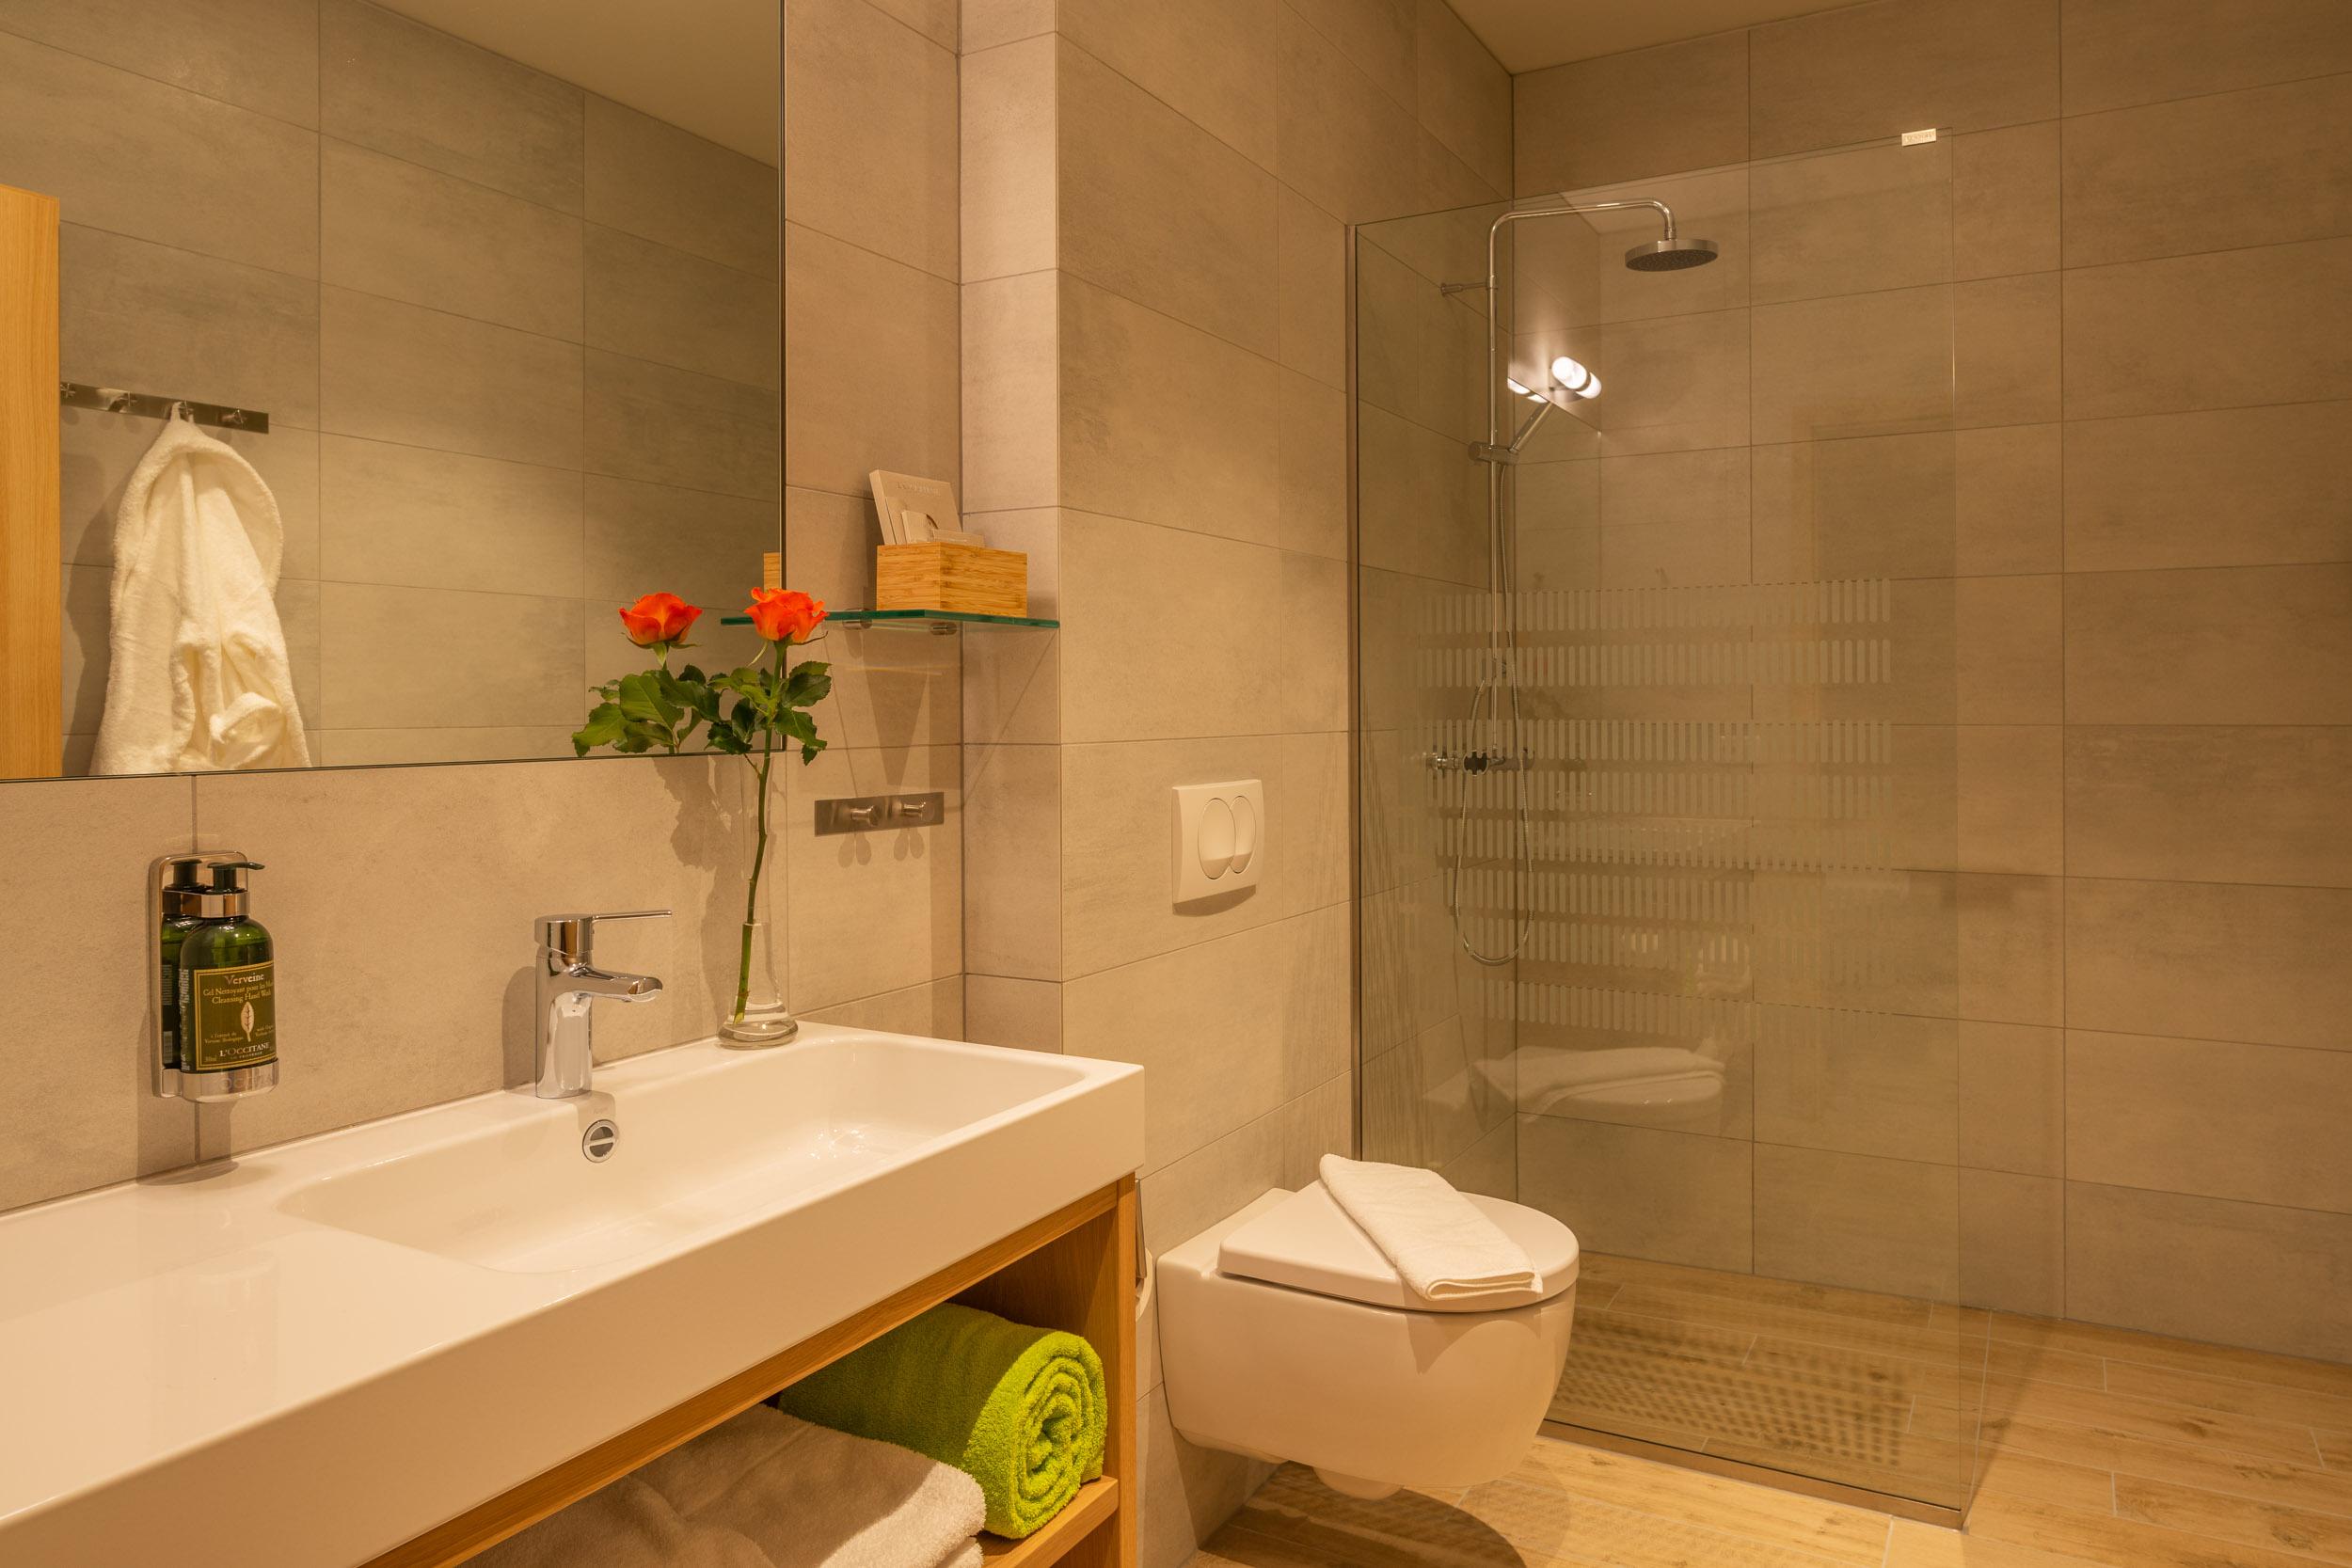 Northern Light Inn deluxe bathroom